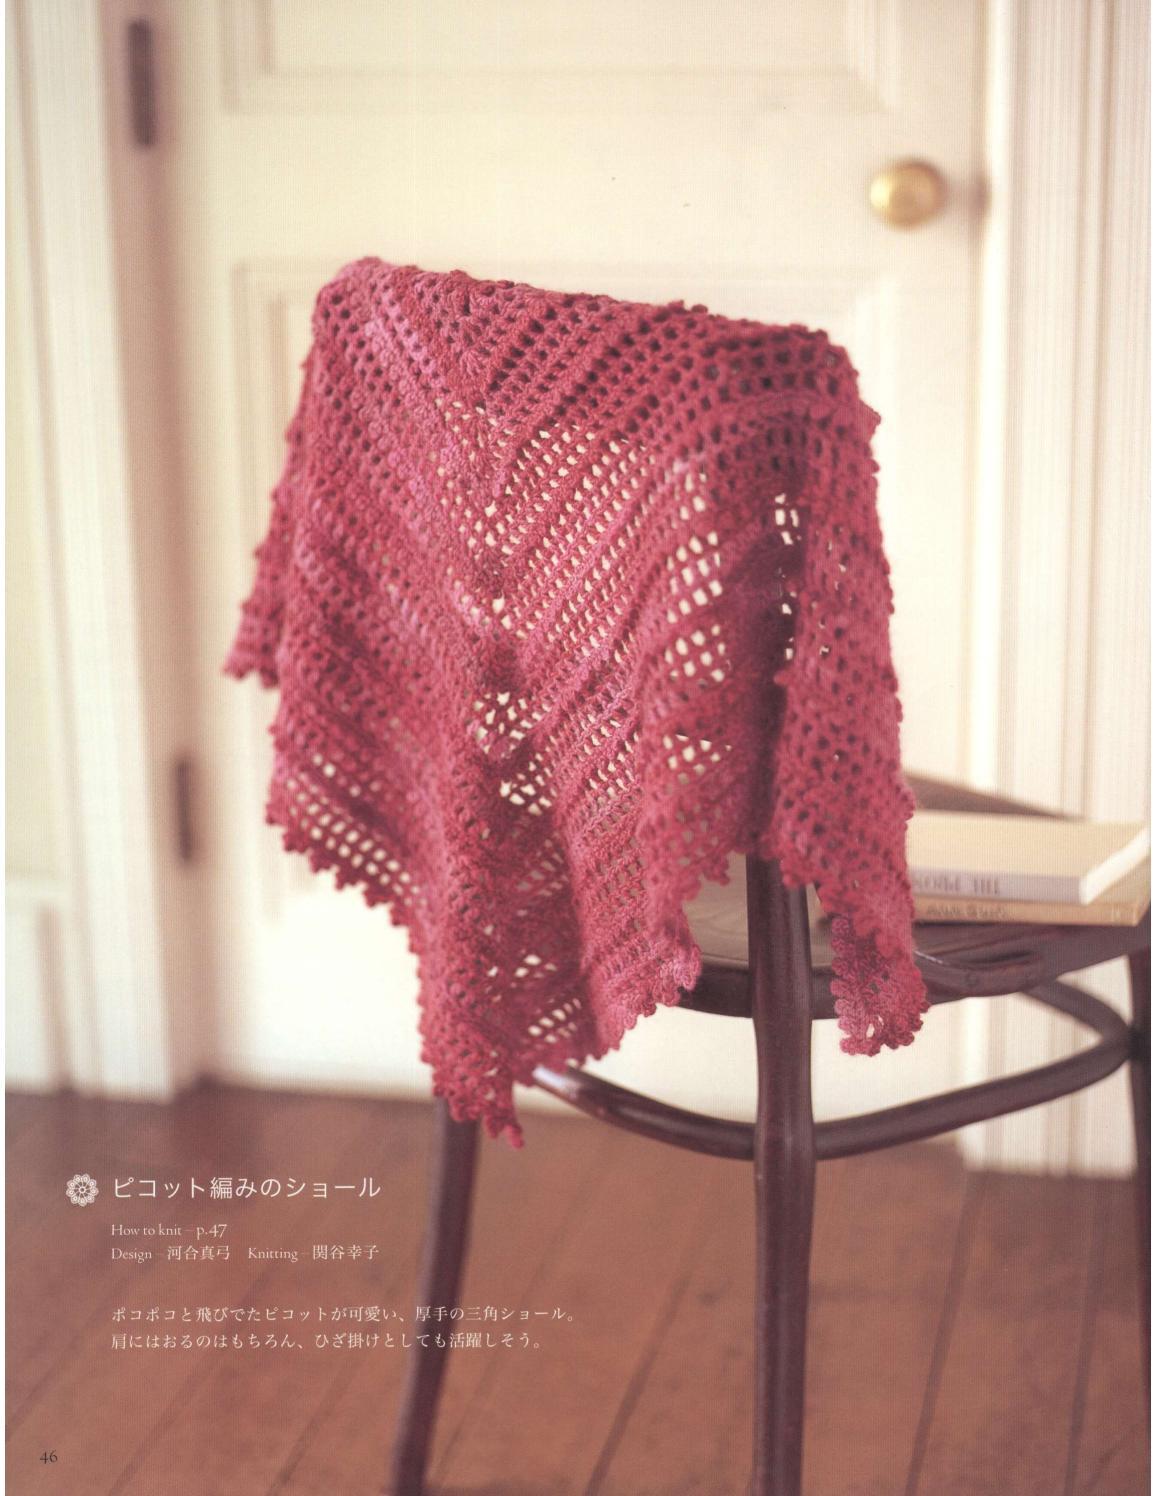 Asahi original crochet best selection 2012 page 46